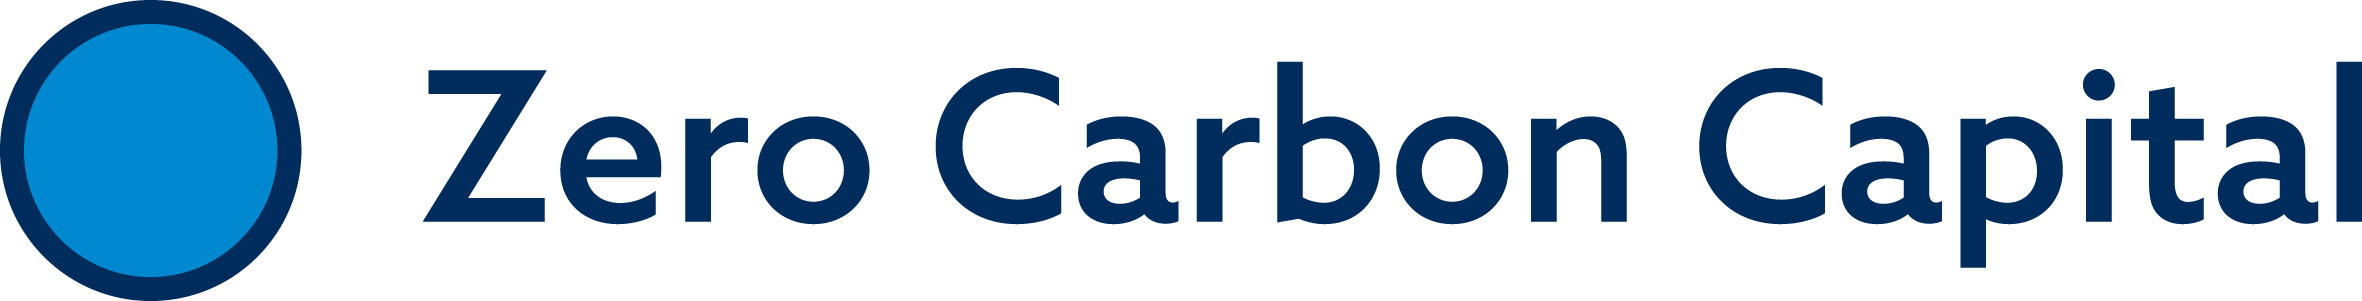 Zero Carbon Capital Ltd